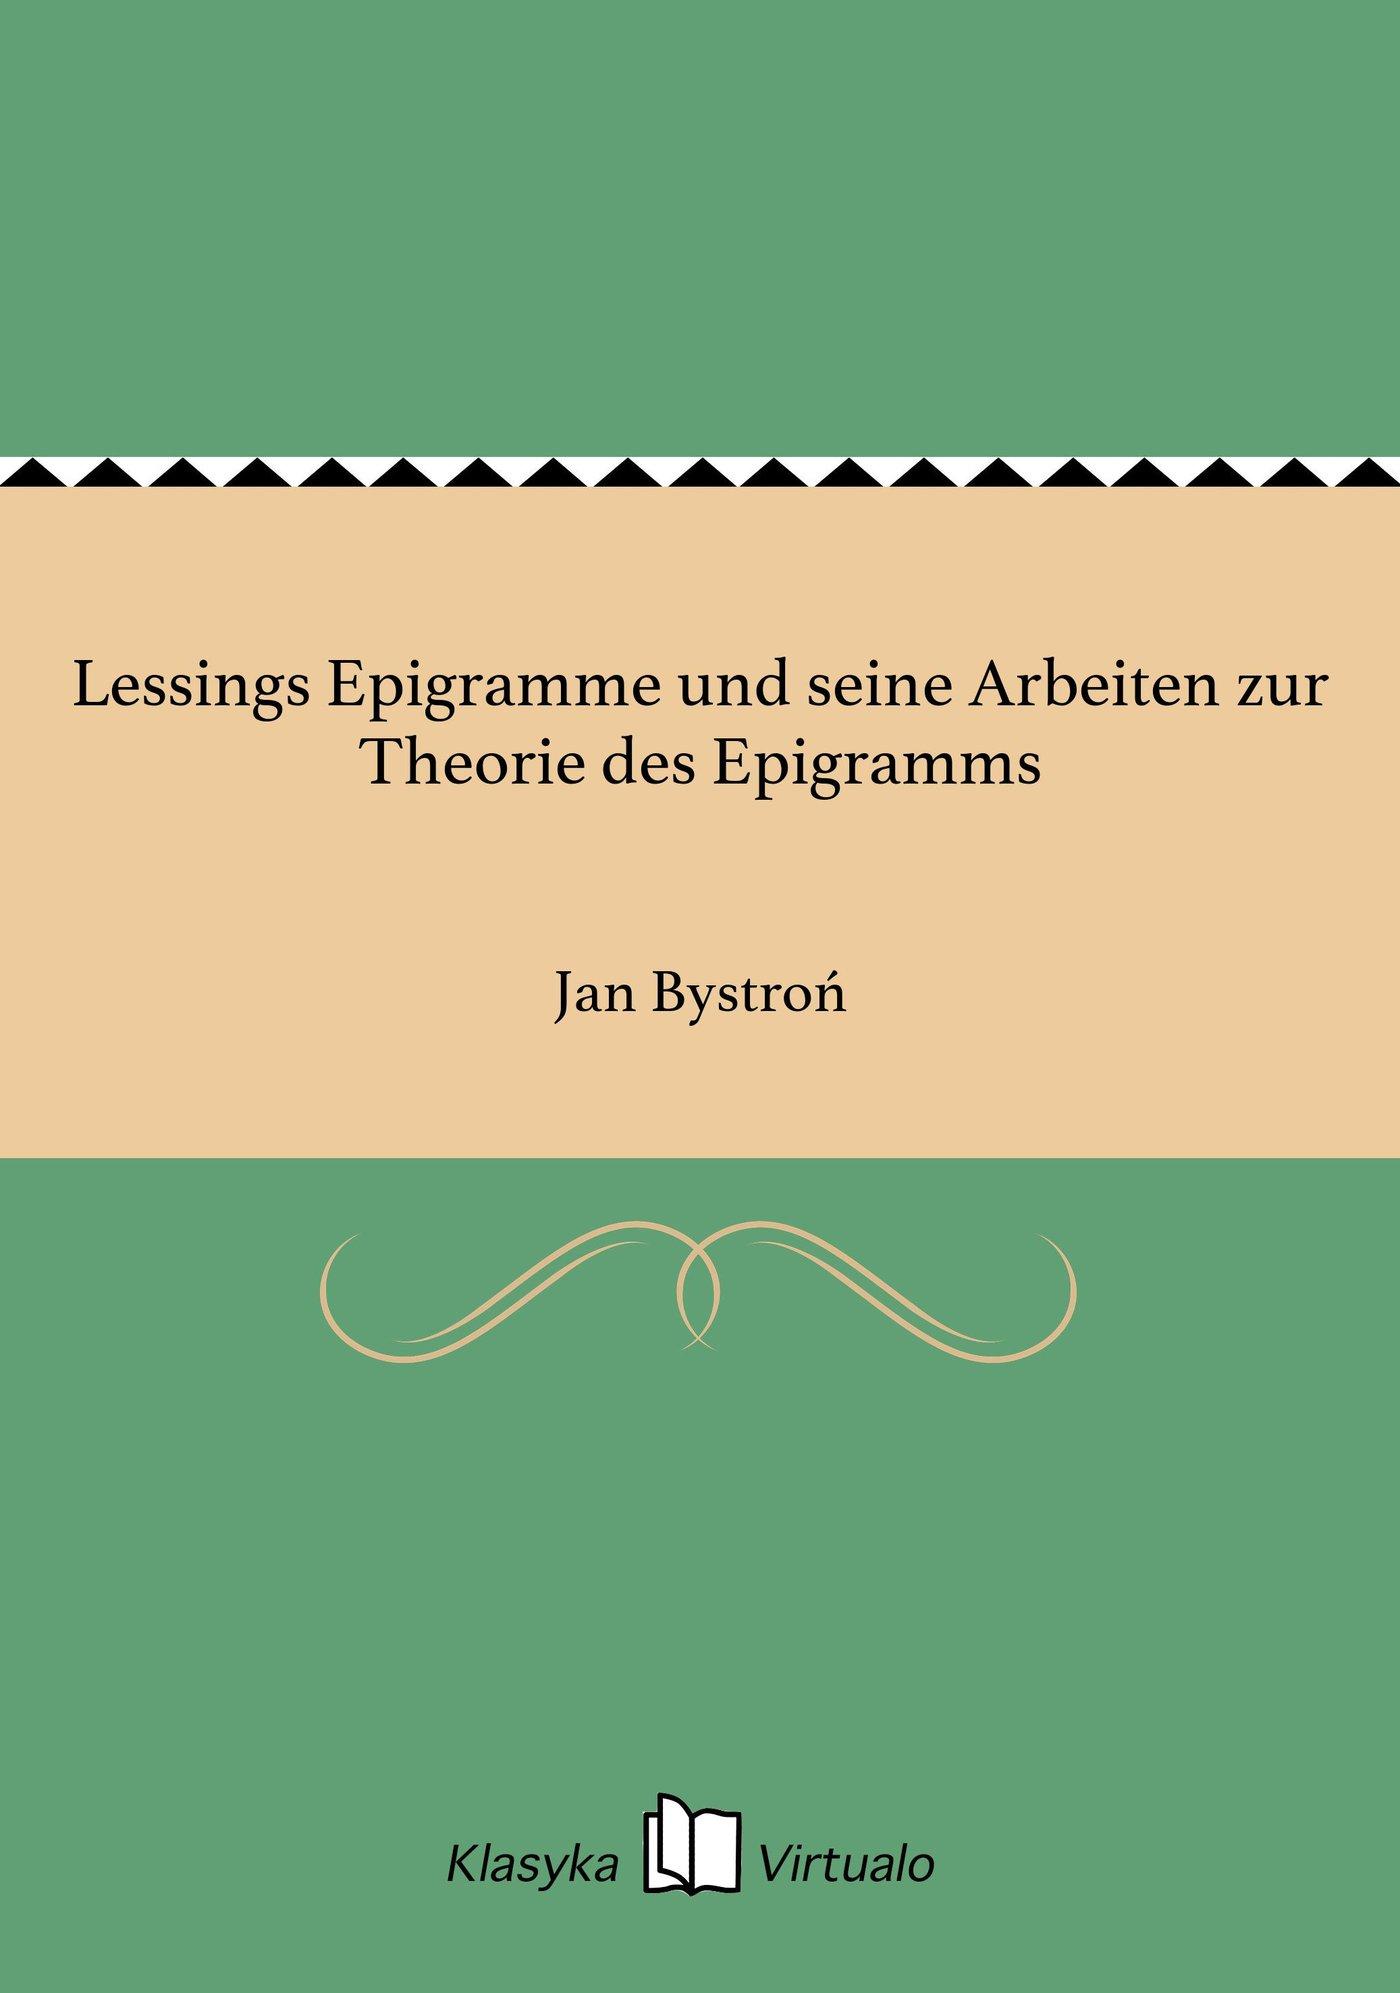 Lessings Epigramme und seine Arbeiten zur Theorie des Epigramms - Ebook (Książka EPUB) do pobrania w formacie EPUB